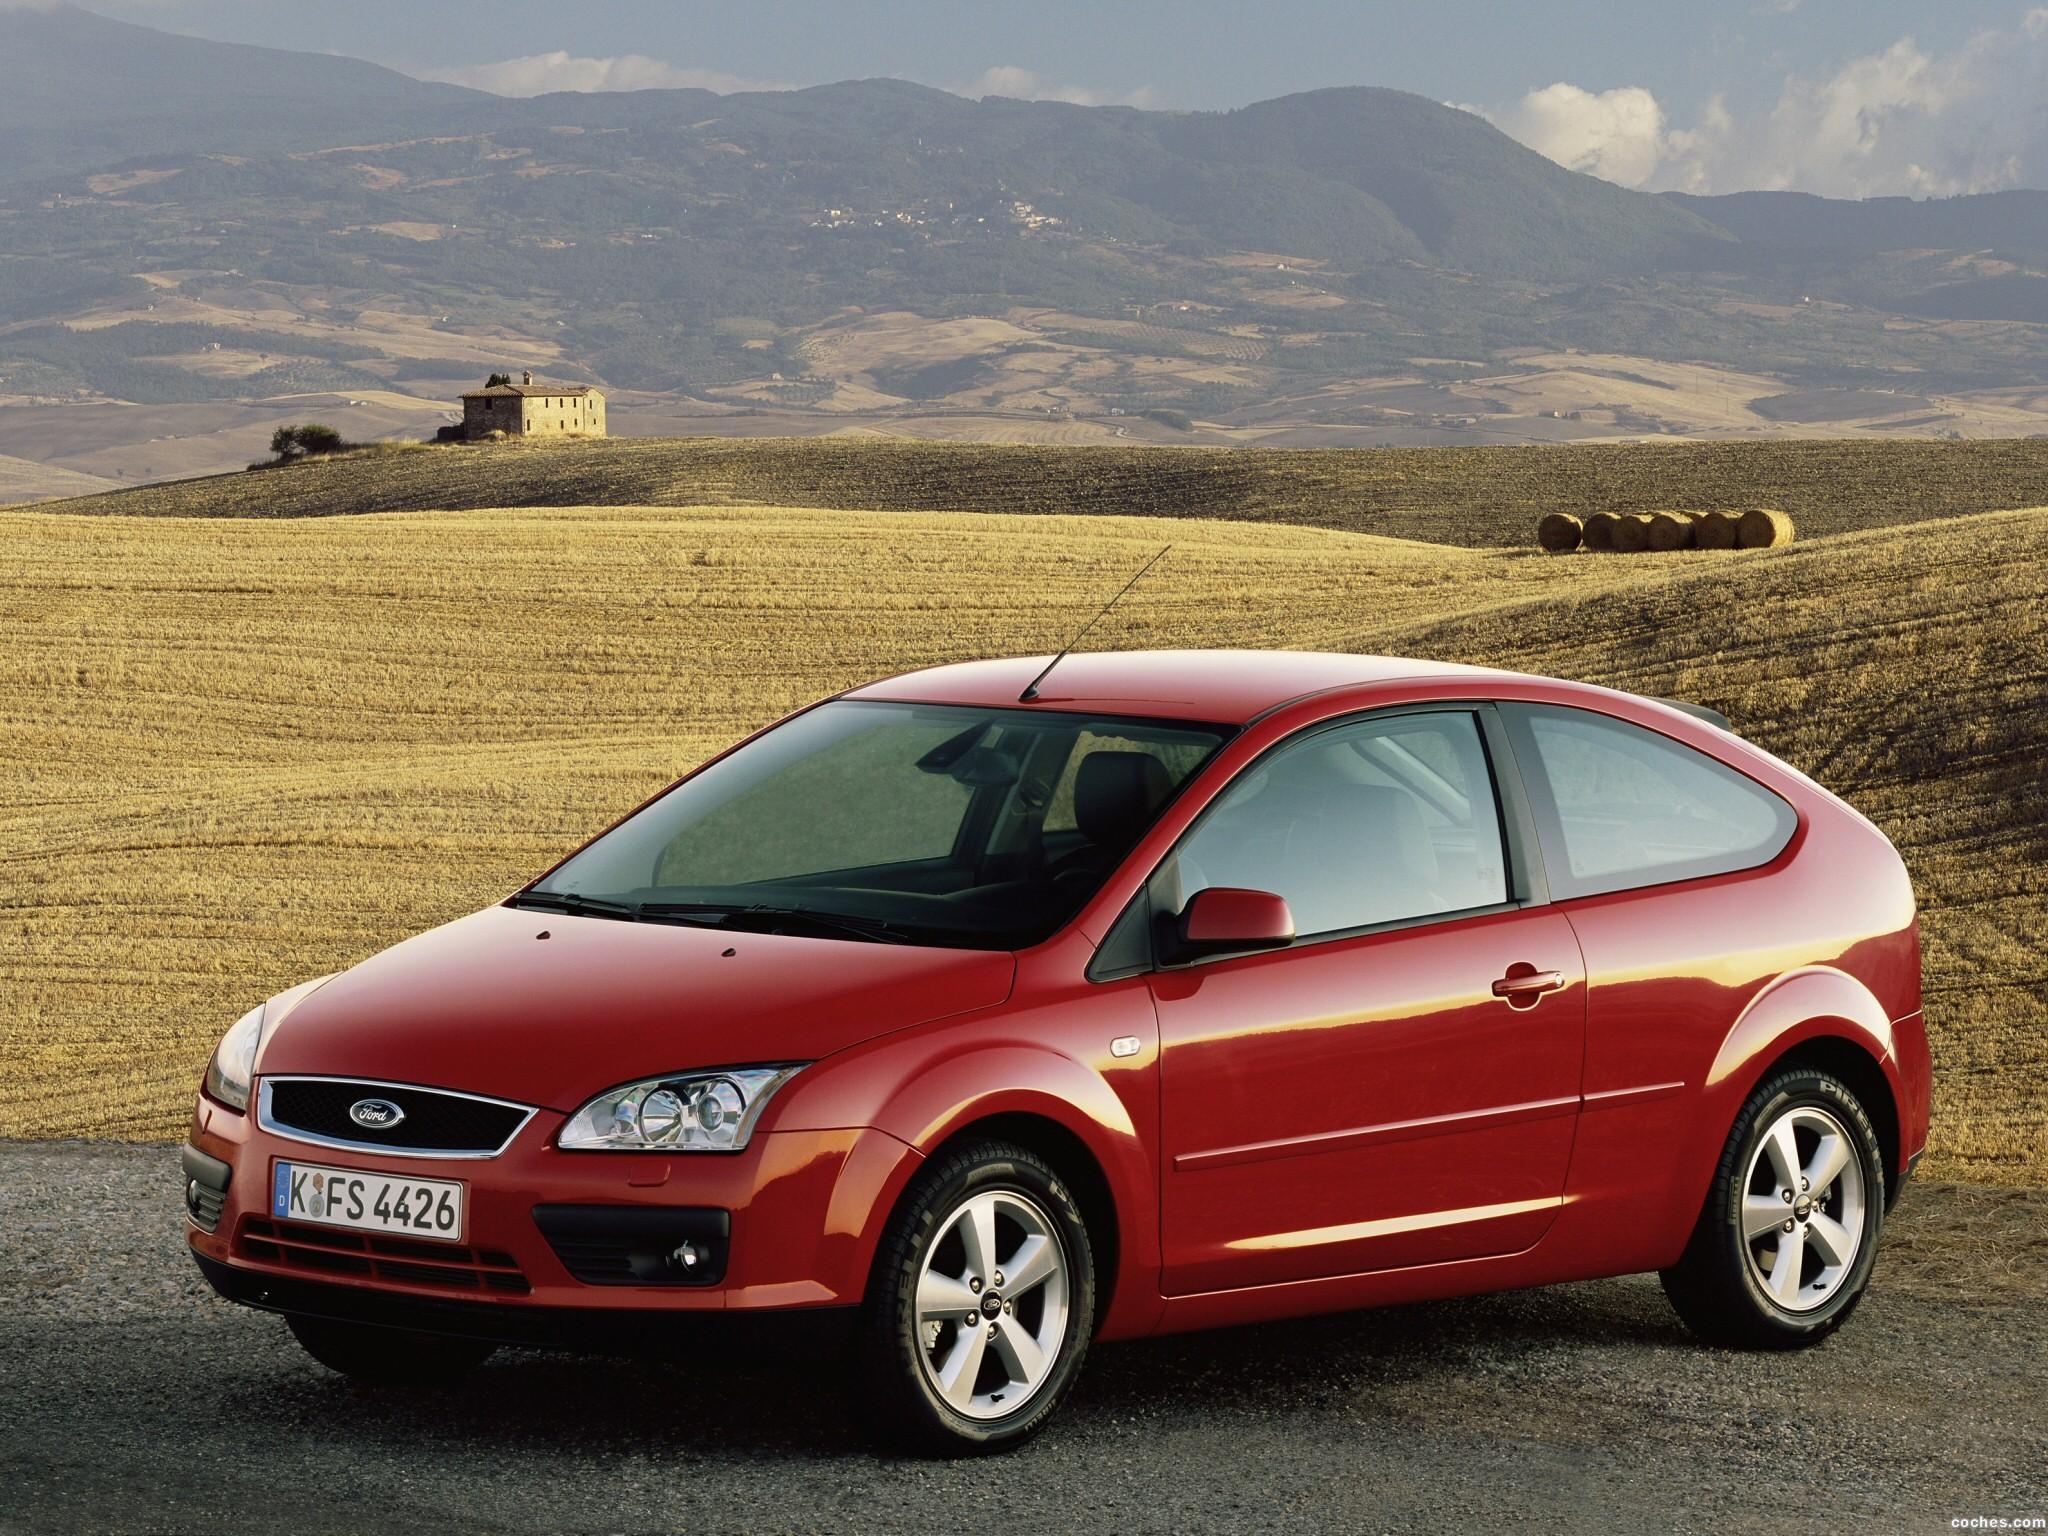 Foto 1 de Ford Focus 2005